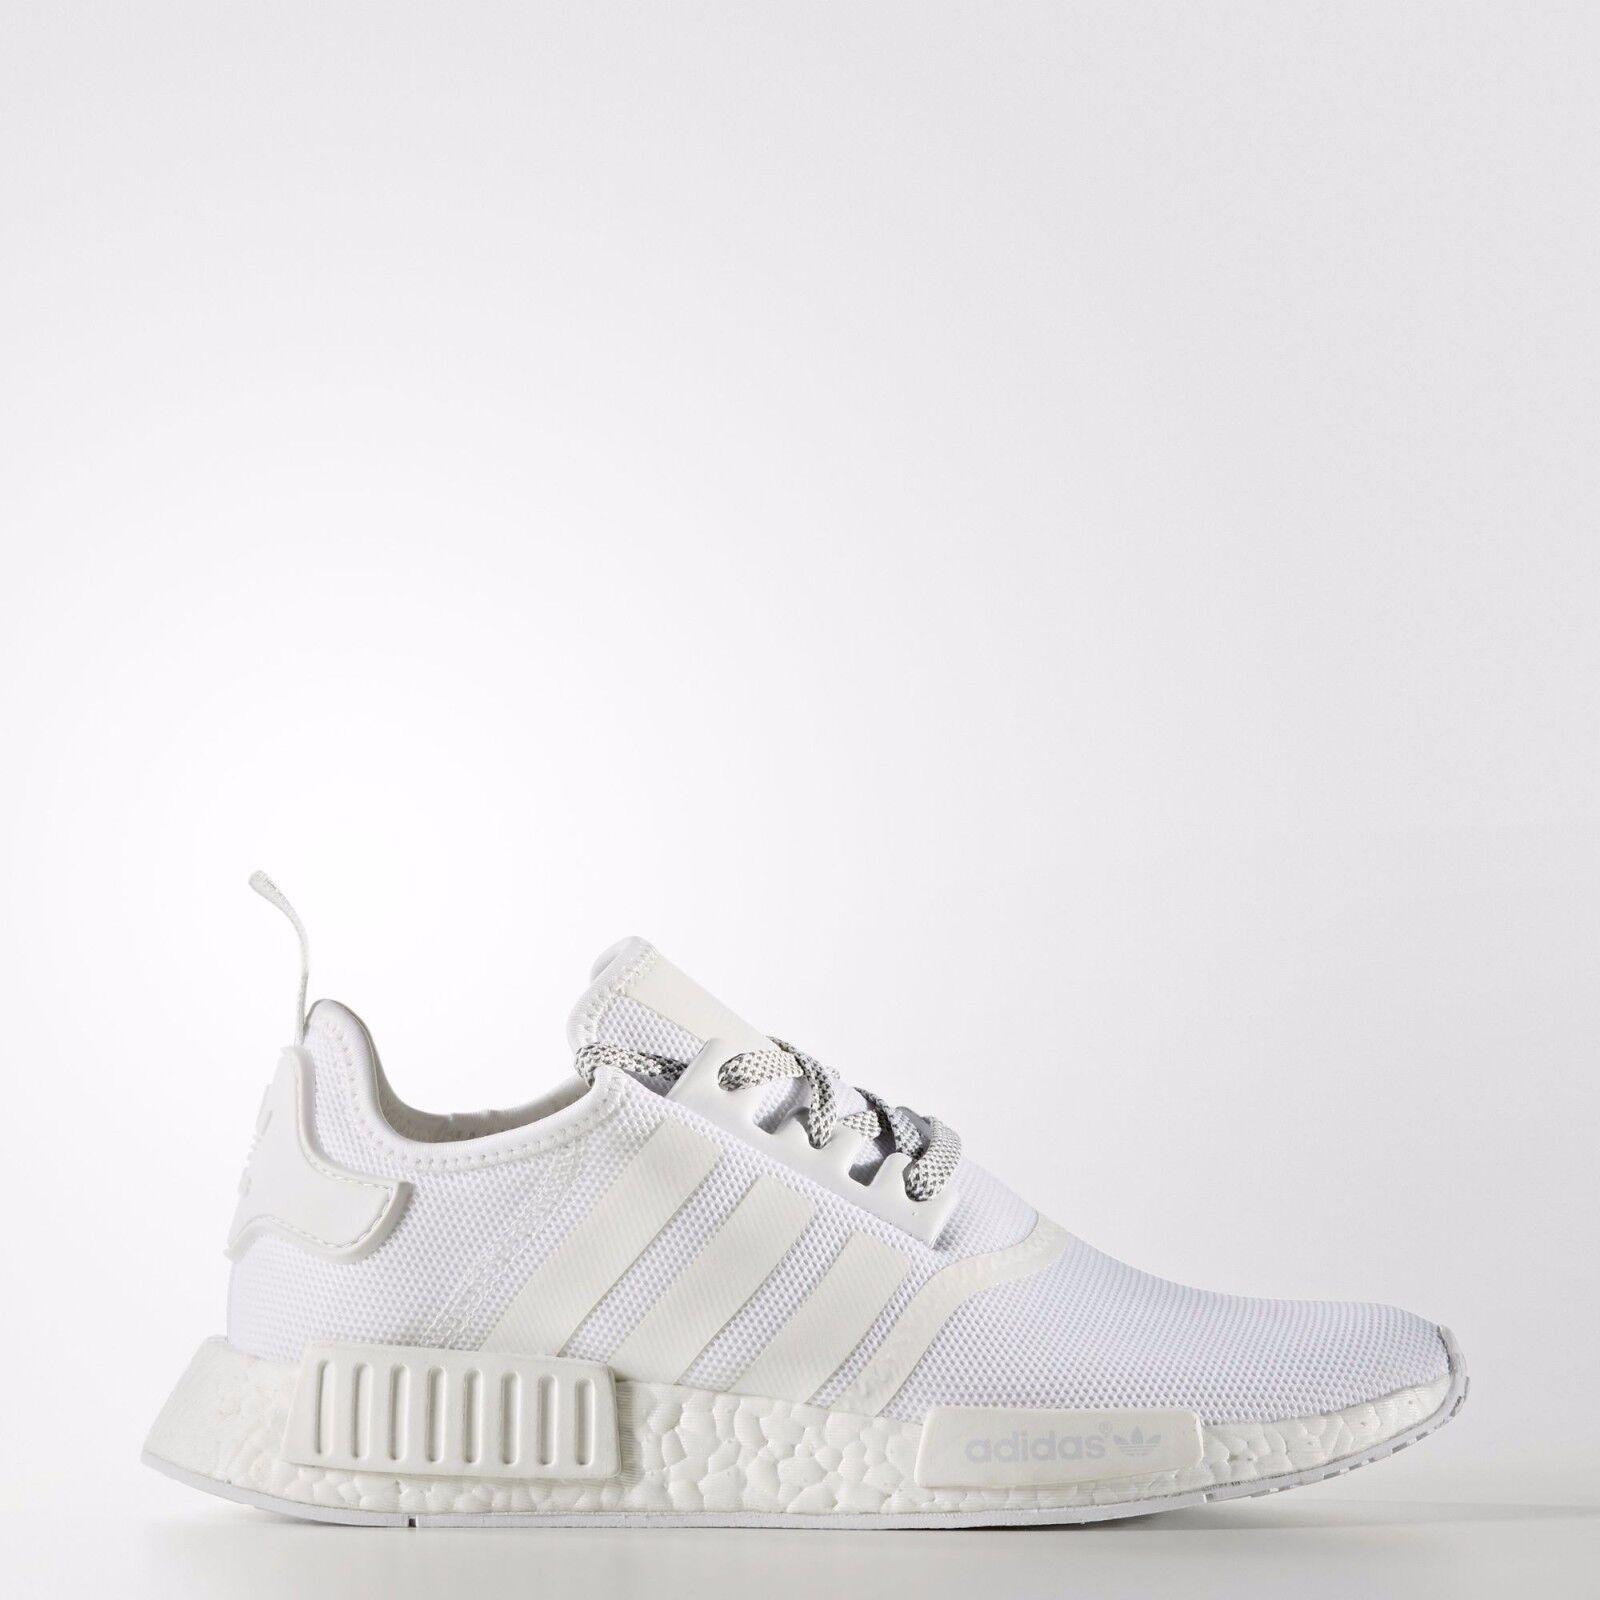 Adidas NMD R1 Triple White 3M REFLECTIVE Monochrome S31506 Men Size  mesh rare